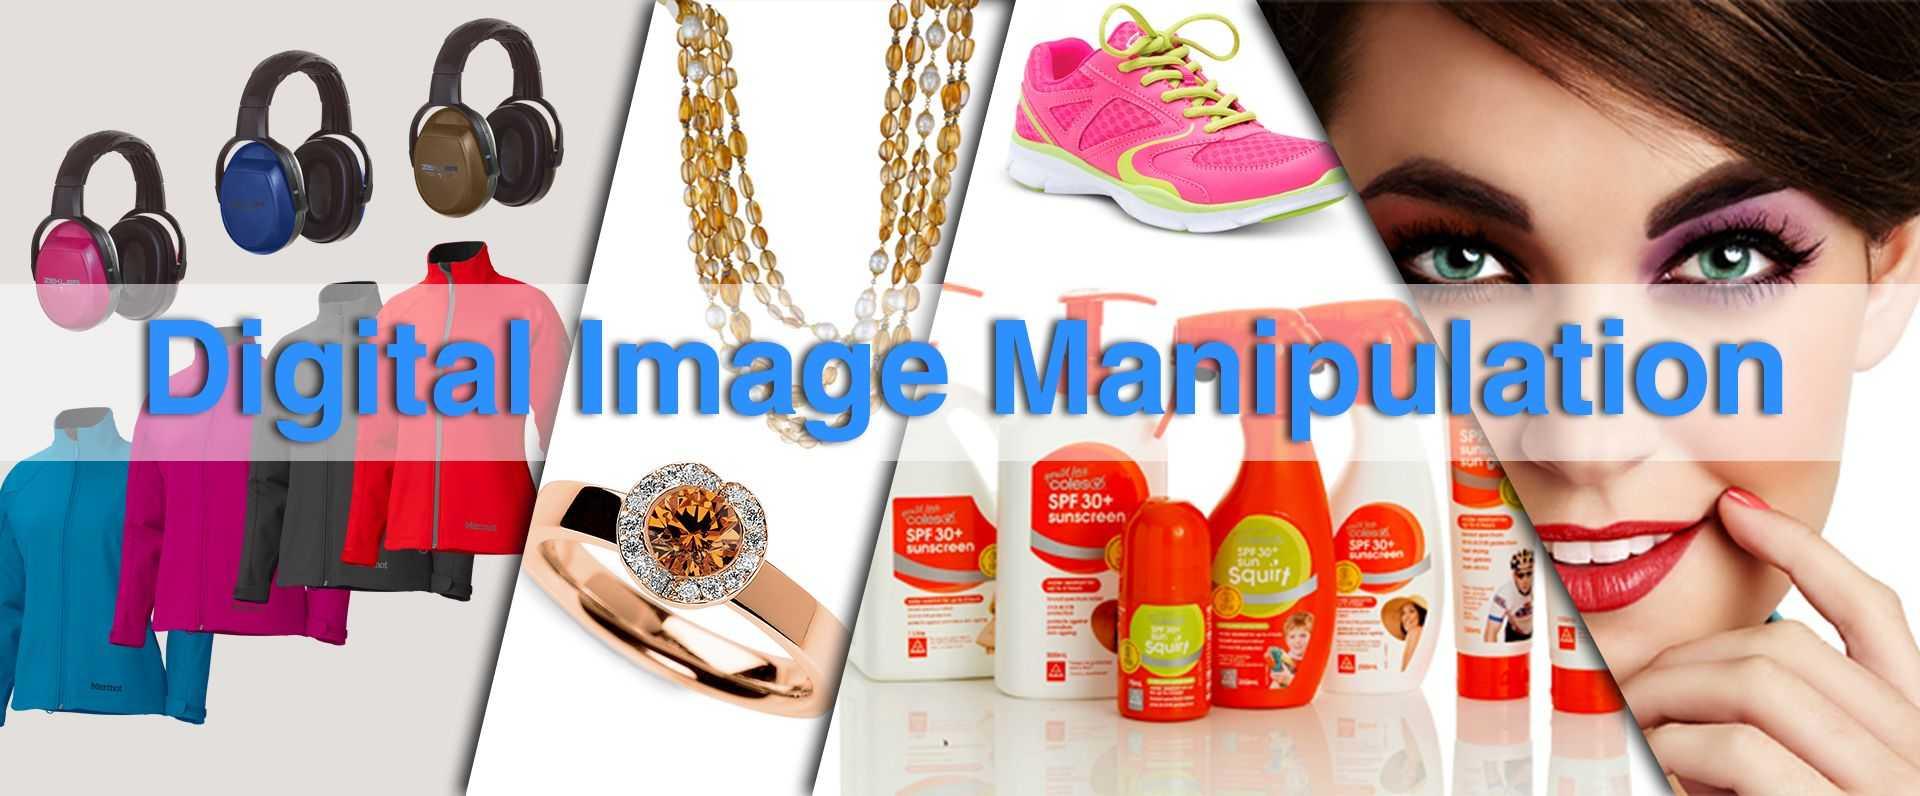 Digital Image Manipulation